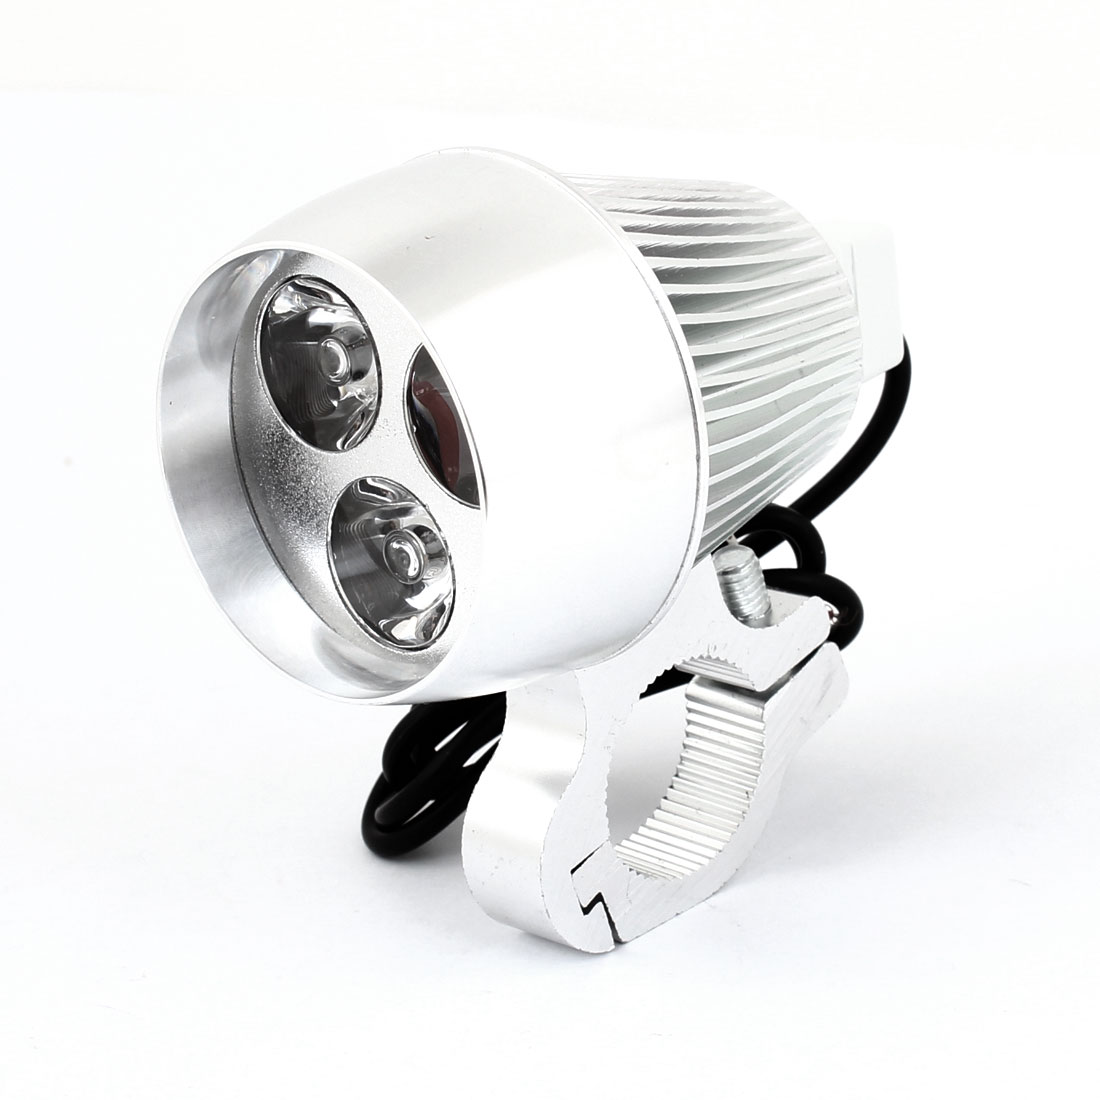 Motorcycle Aluminum Shell Blue 3 LED Dragon Eye Decorative Spot Light Lamp